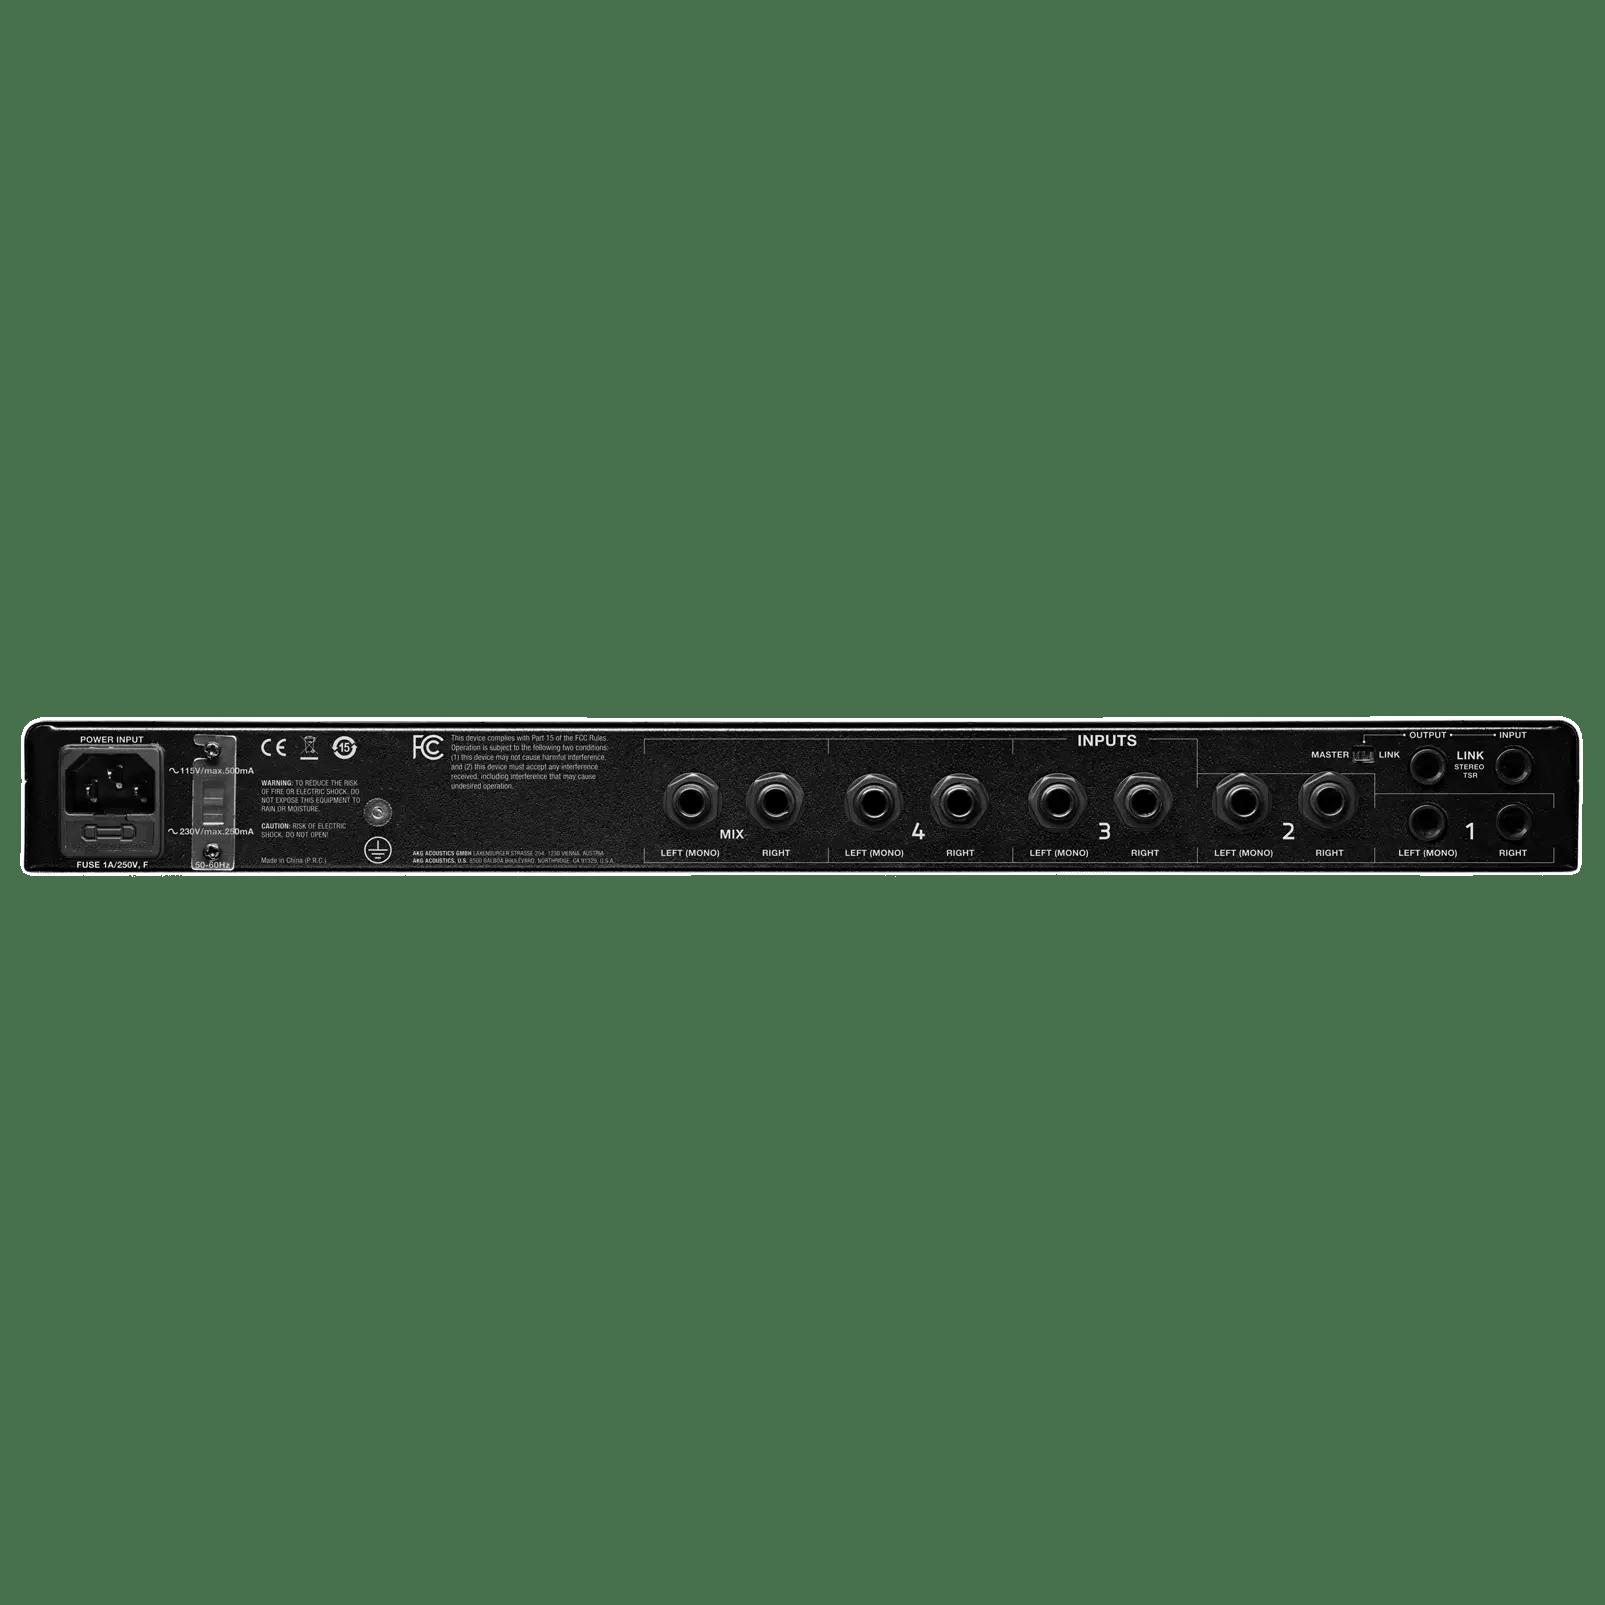 small resolution of hp6e 6 channel matrix headphone amplifier headphone amp v10 schematic